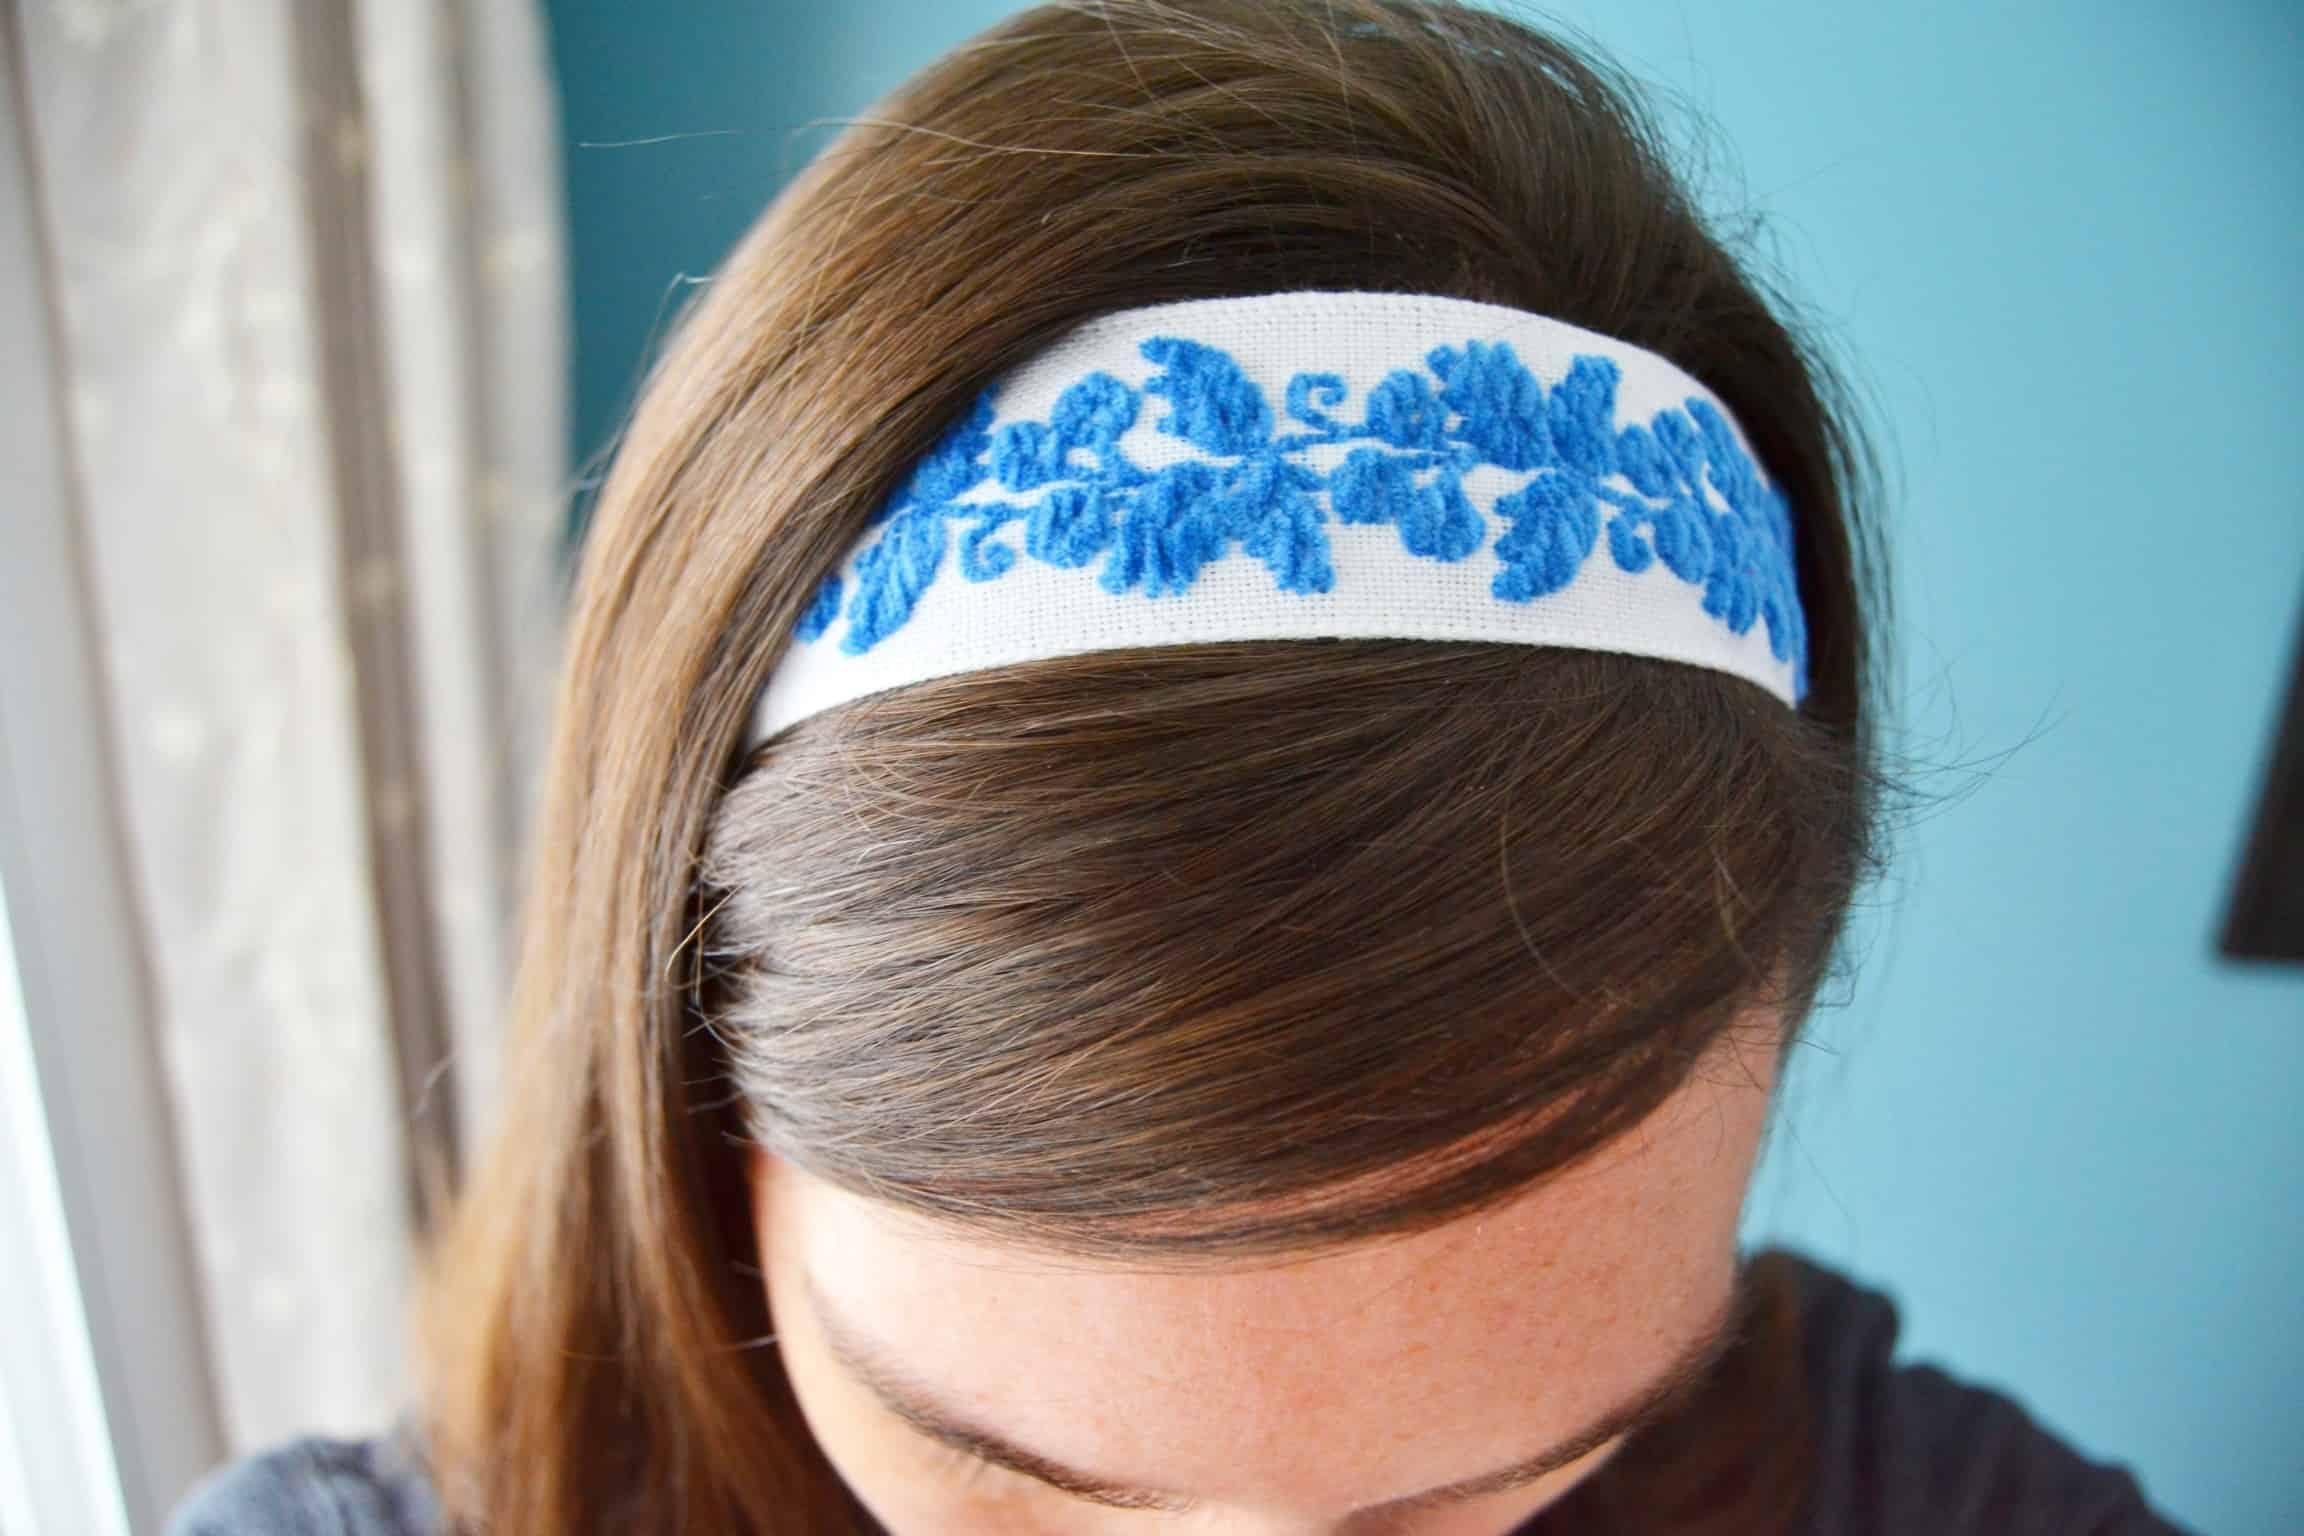 DIY Headbands No Sew Tutorial